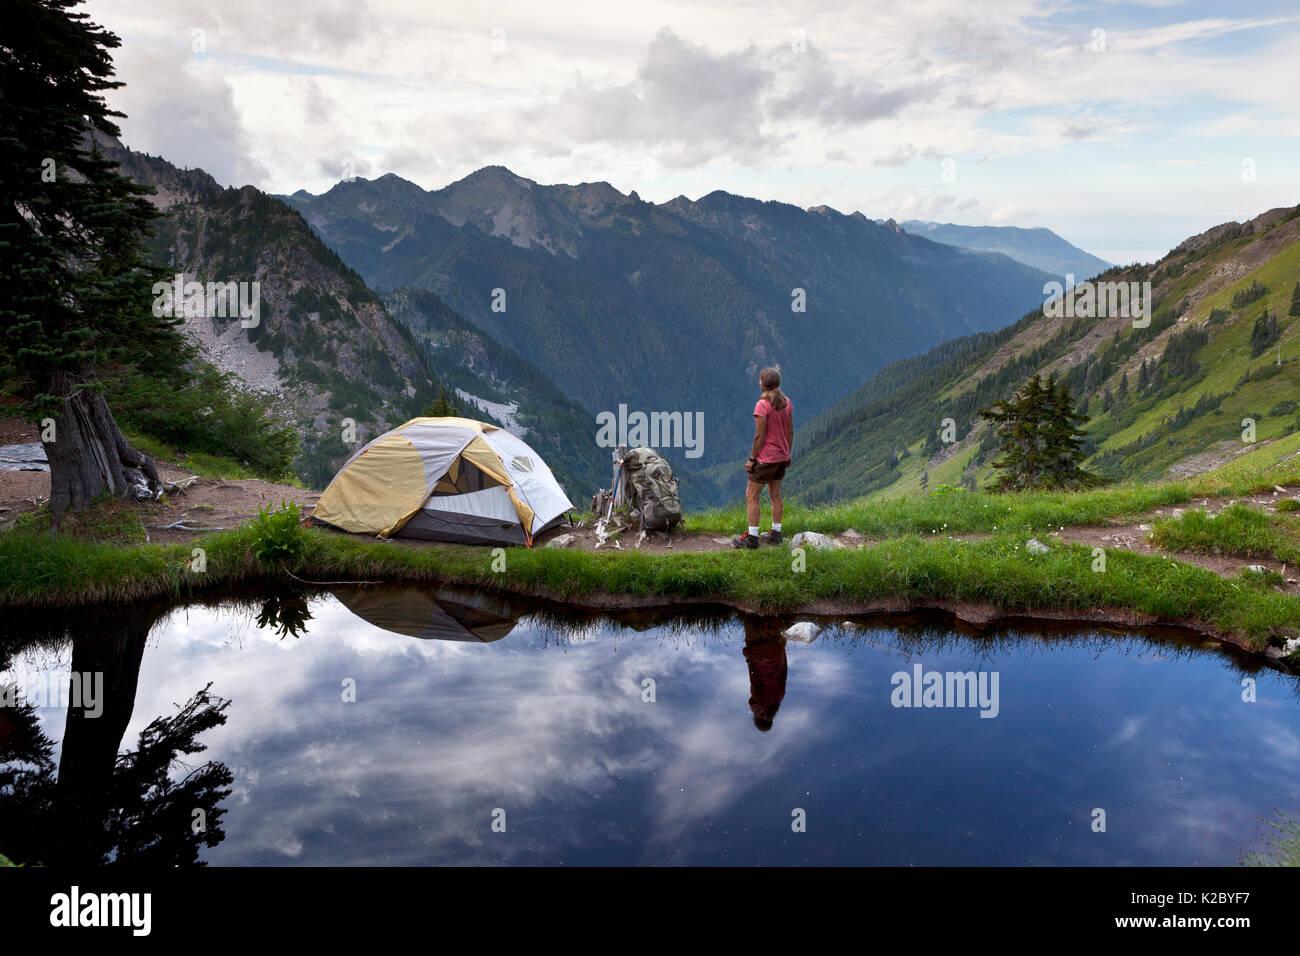 Campingplatz in Wasser bei Boston Charlie's Camp, Bailey, Olympic National Park, Washington, USA, August 2014 wider. Stockbild